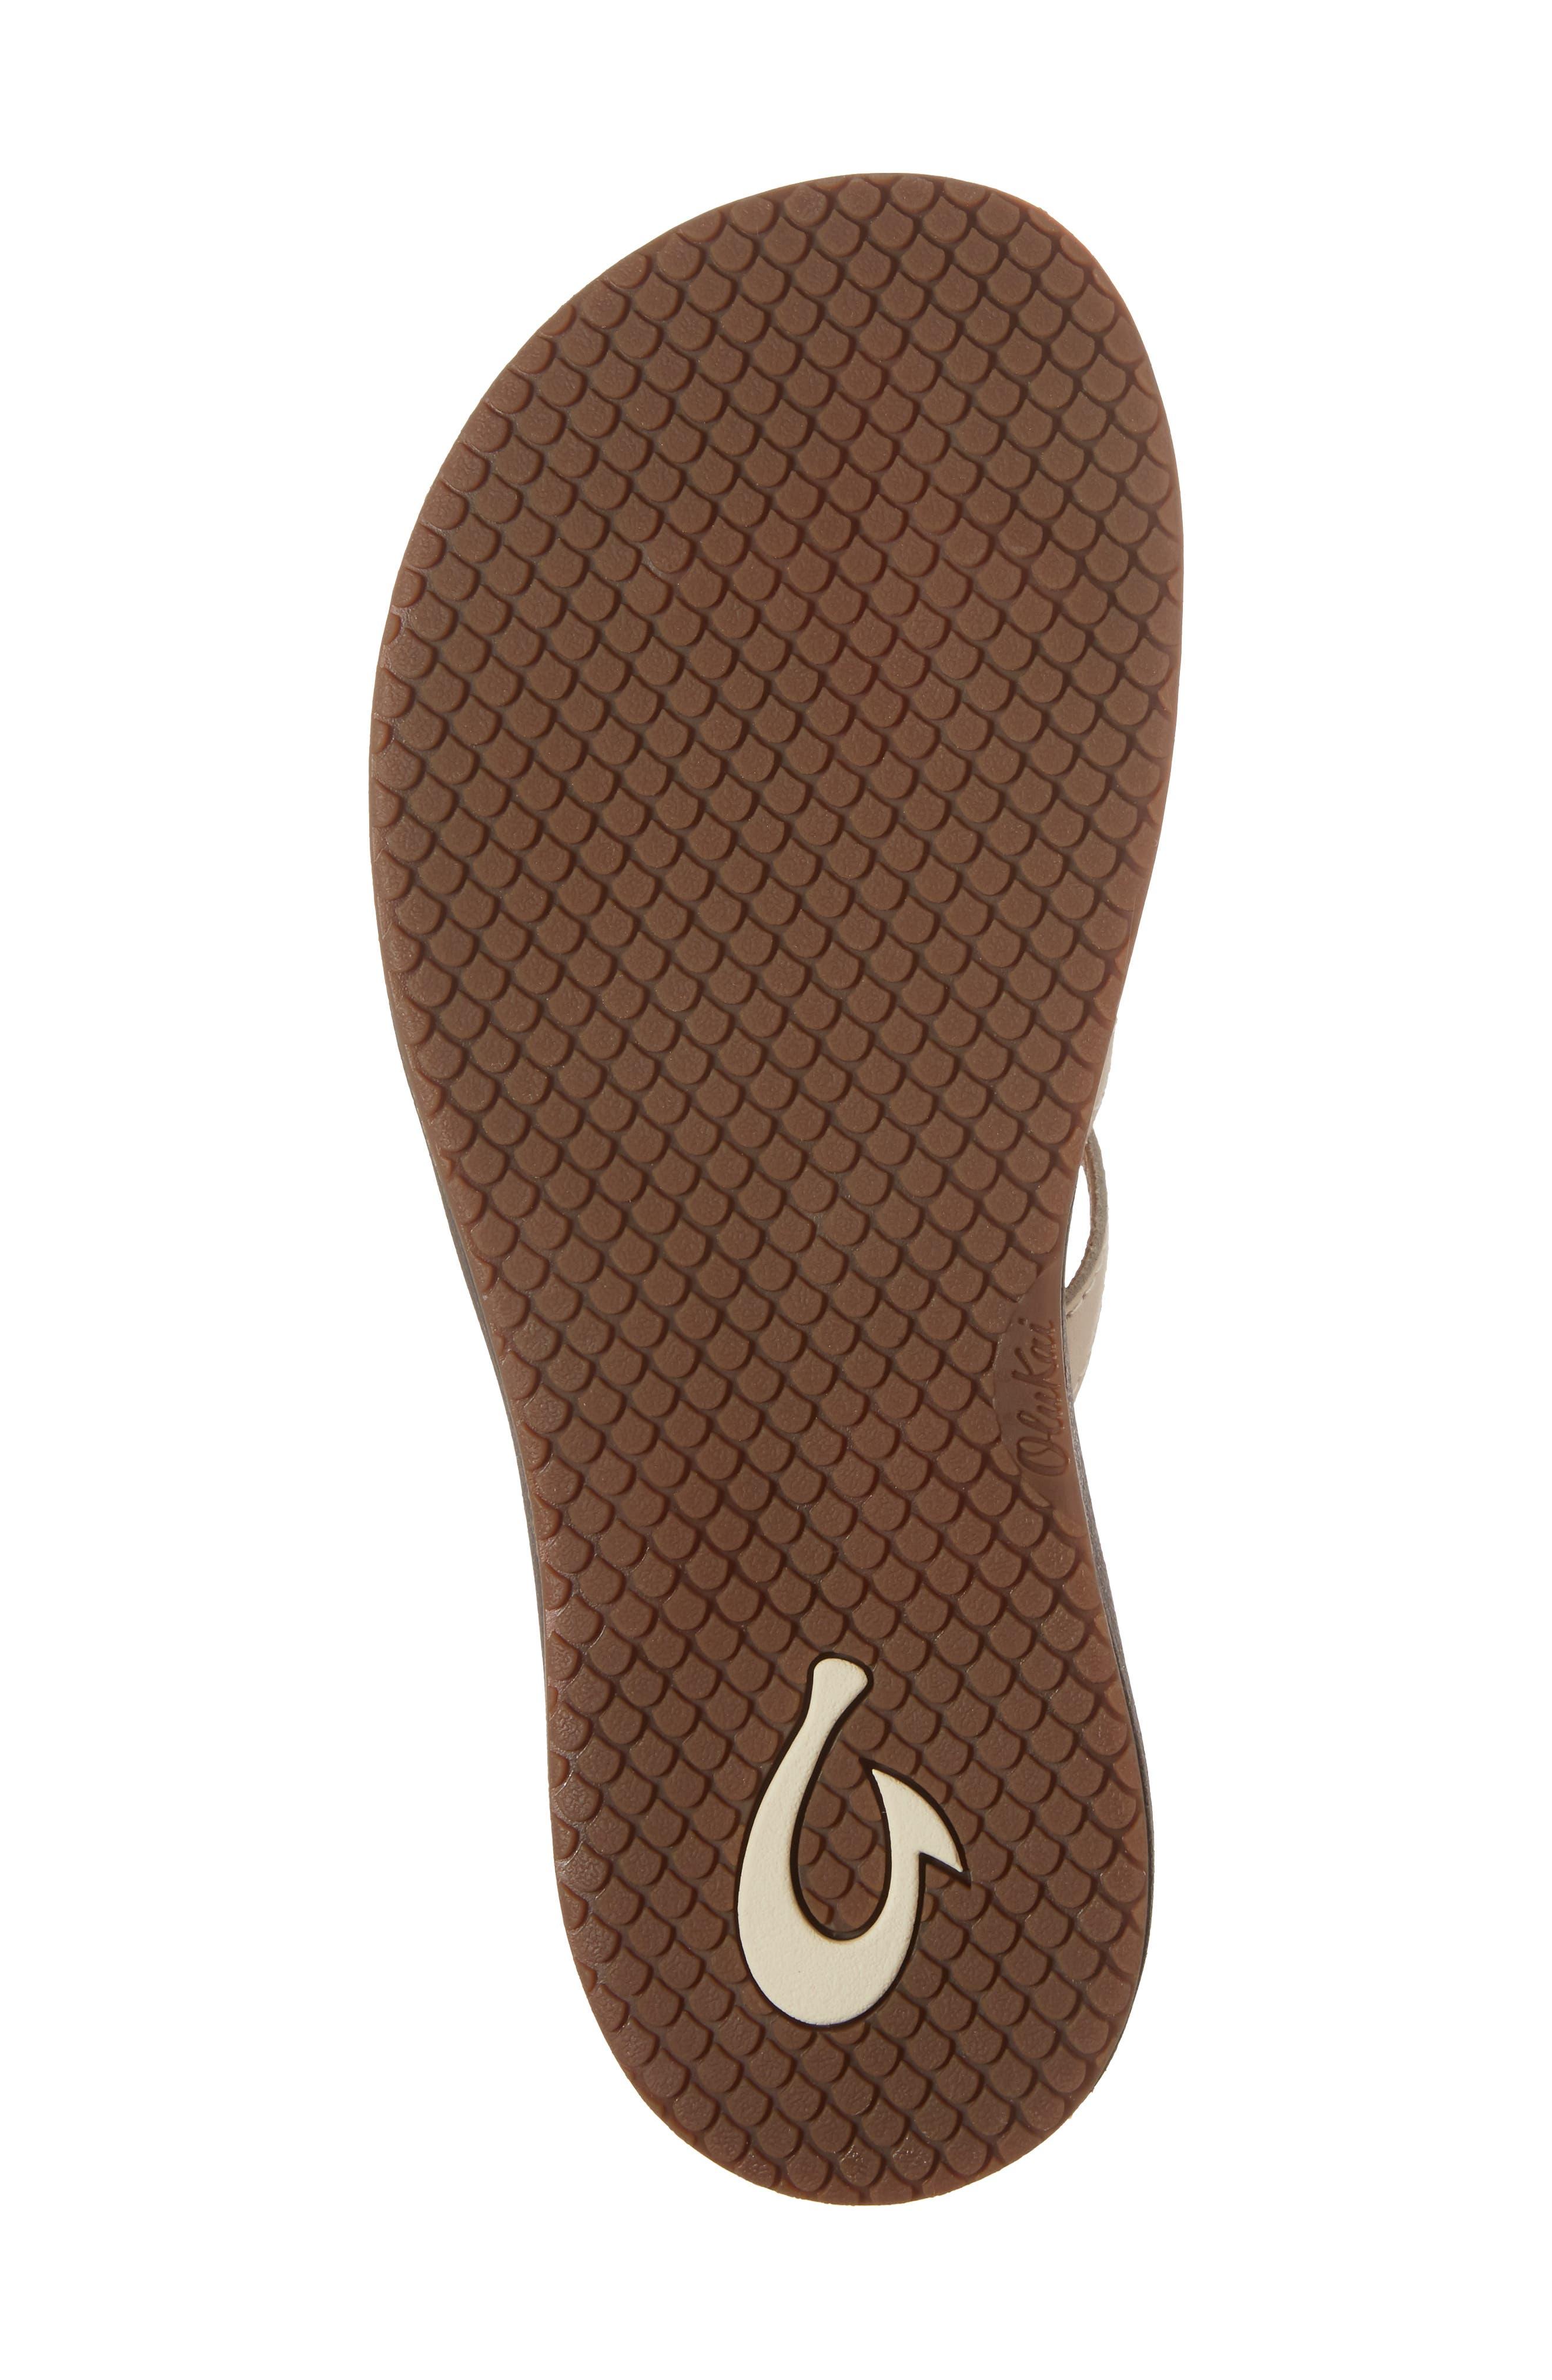 Honoka'a Buckle Flip Flop,                             Alternate thumbnail 6, color,                             Tapa/ Sahara Leather